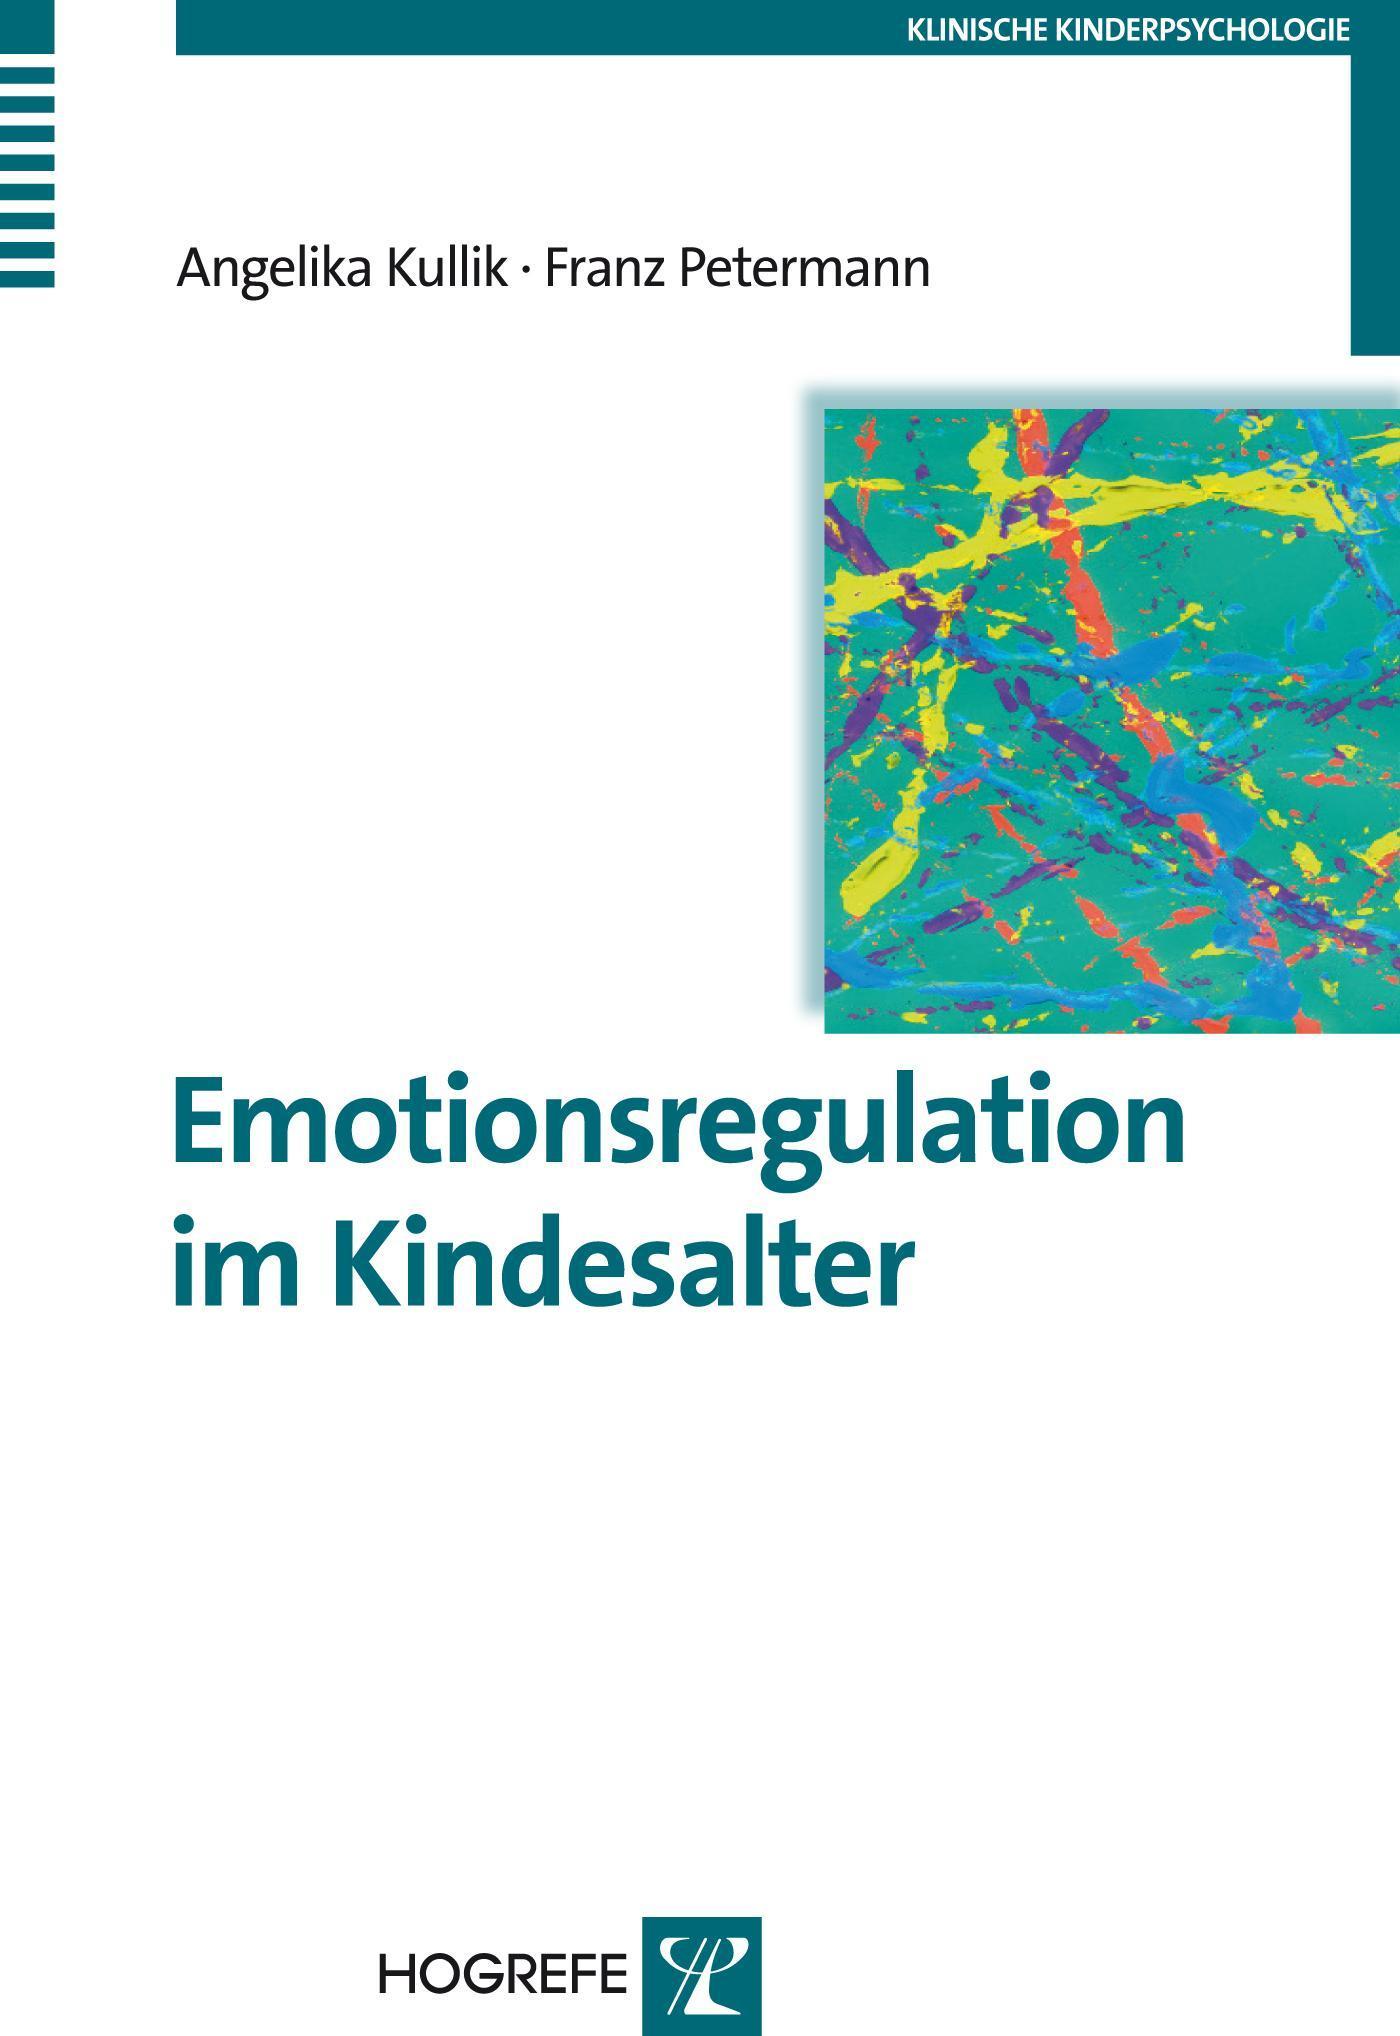 Emotionsregulation im Kindesalter Angelika Kullik